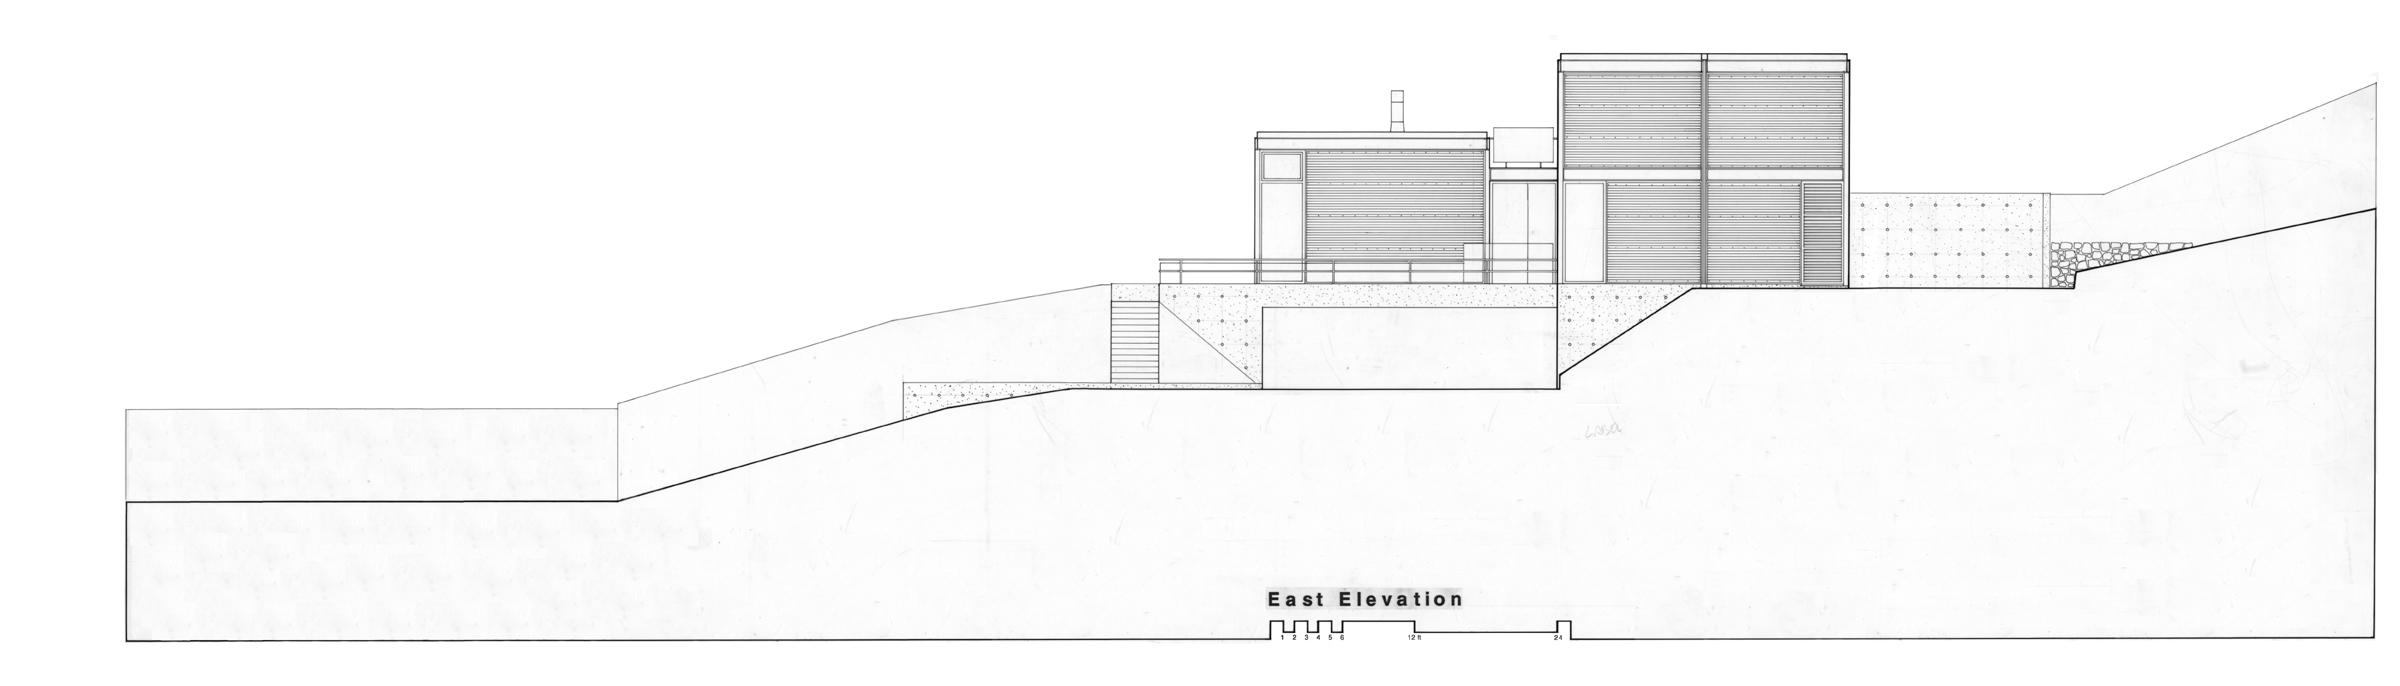 east elevation .jpg